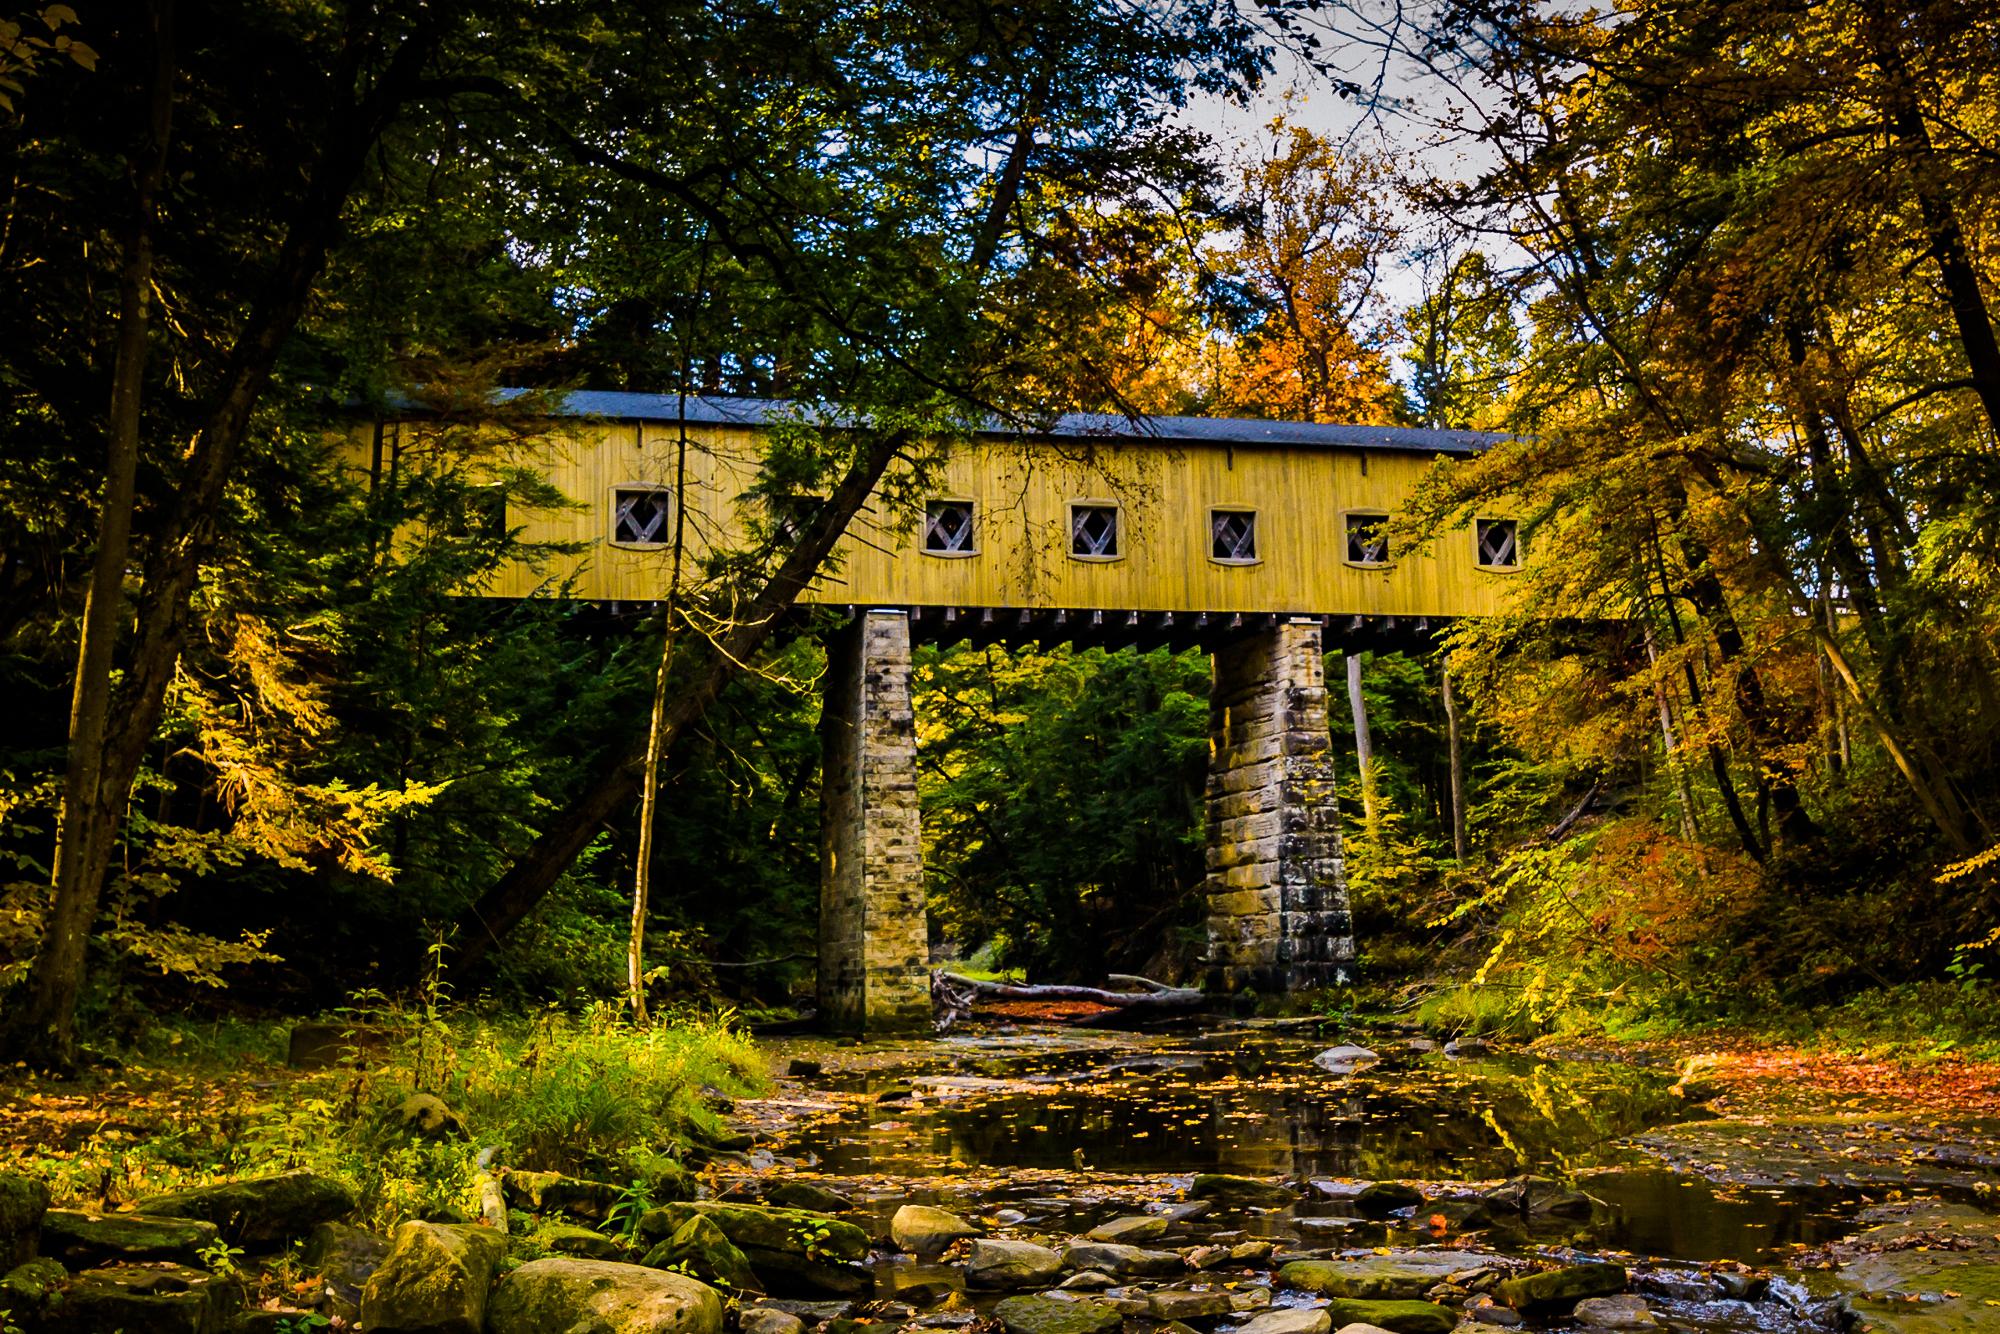 58076A - Covered bridge - Yellow